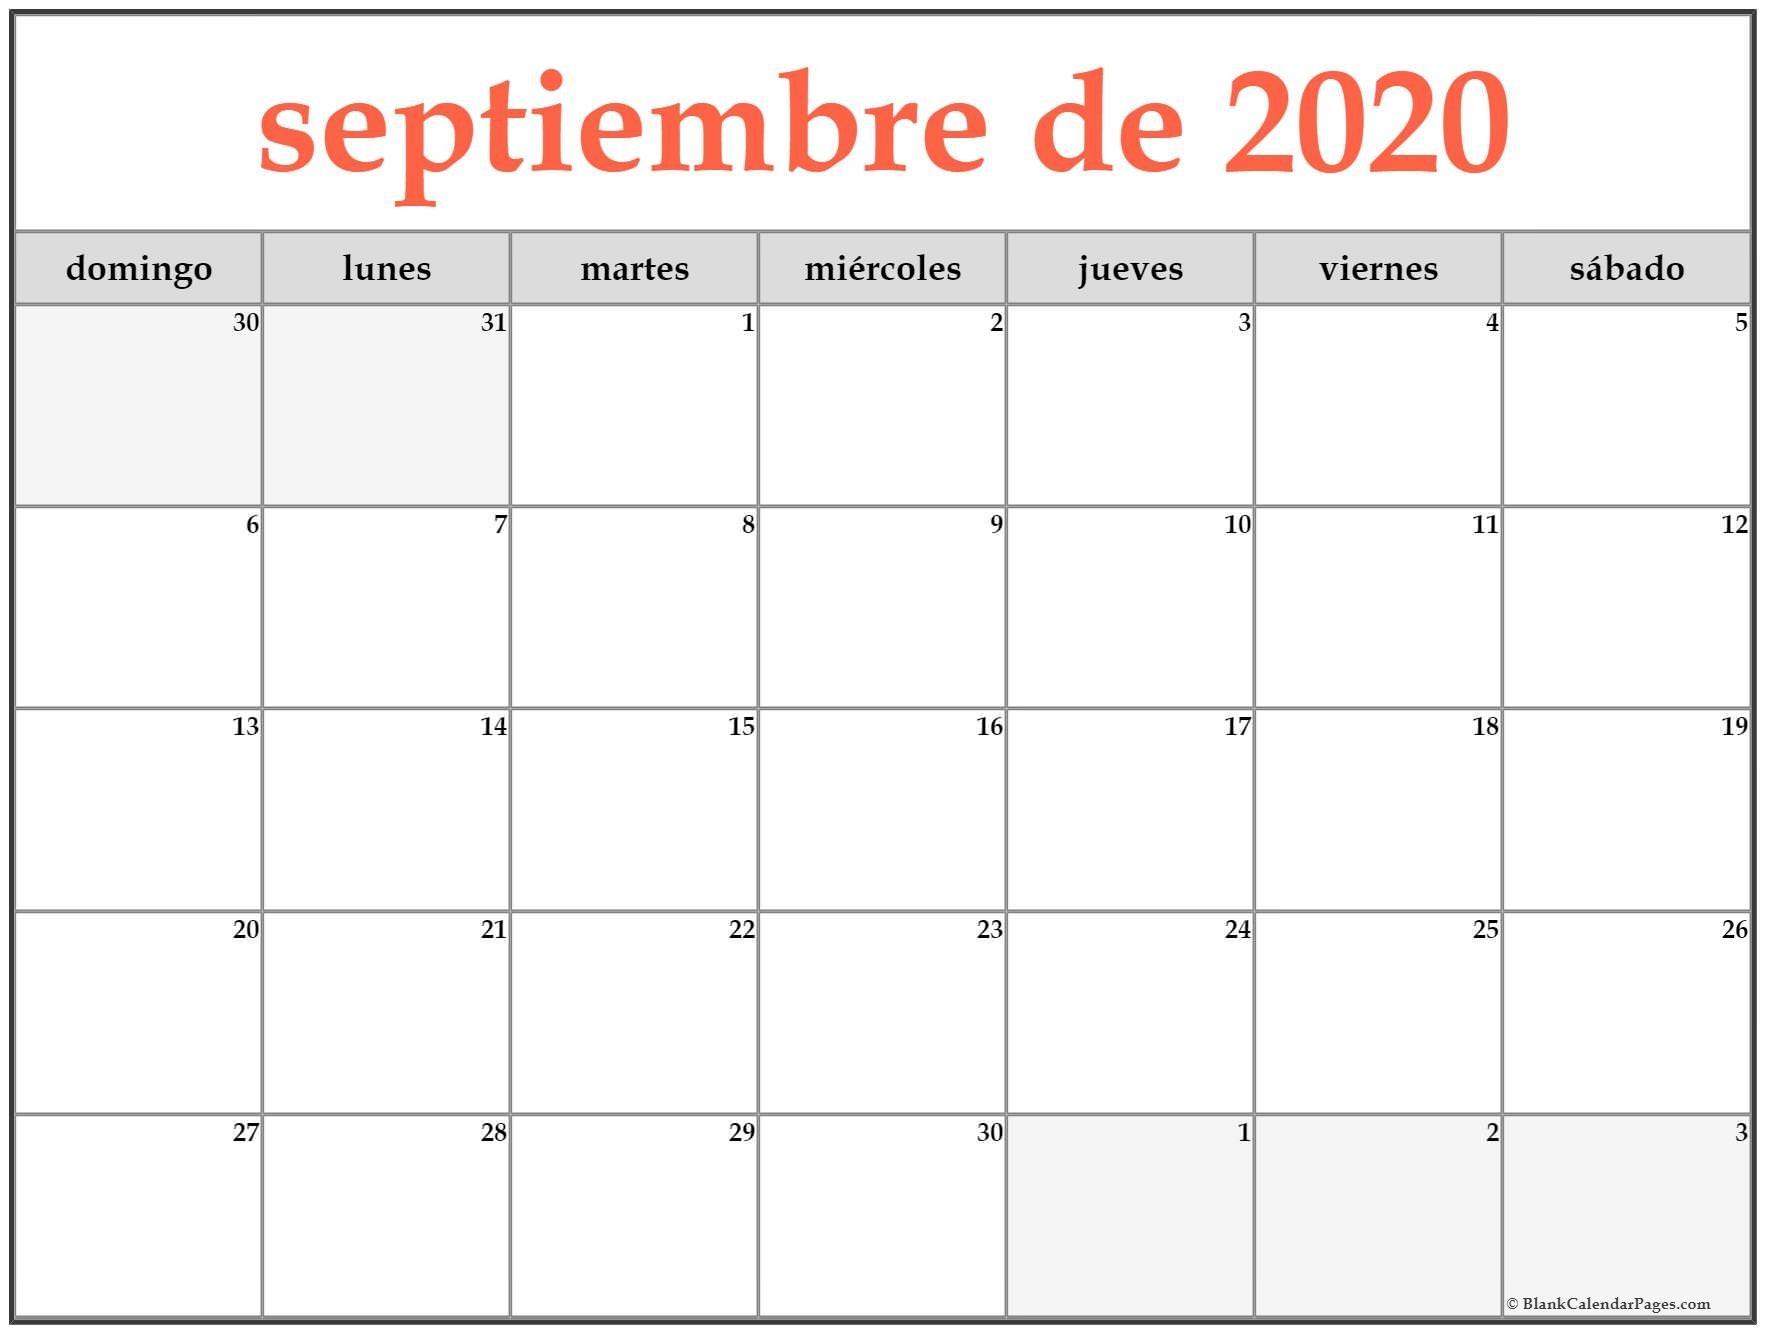 Calendario Septiembre 2020 Para Imprimir - Mangan  Calendario 2020 Mensual Para Imprimir Gratis Febrero